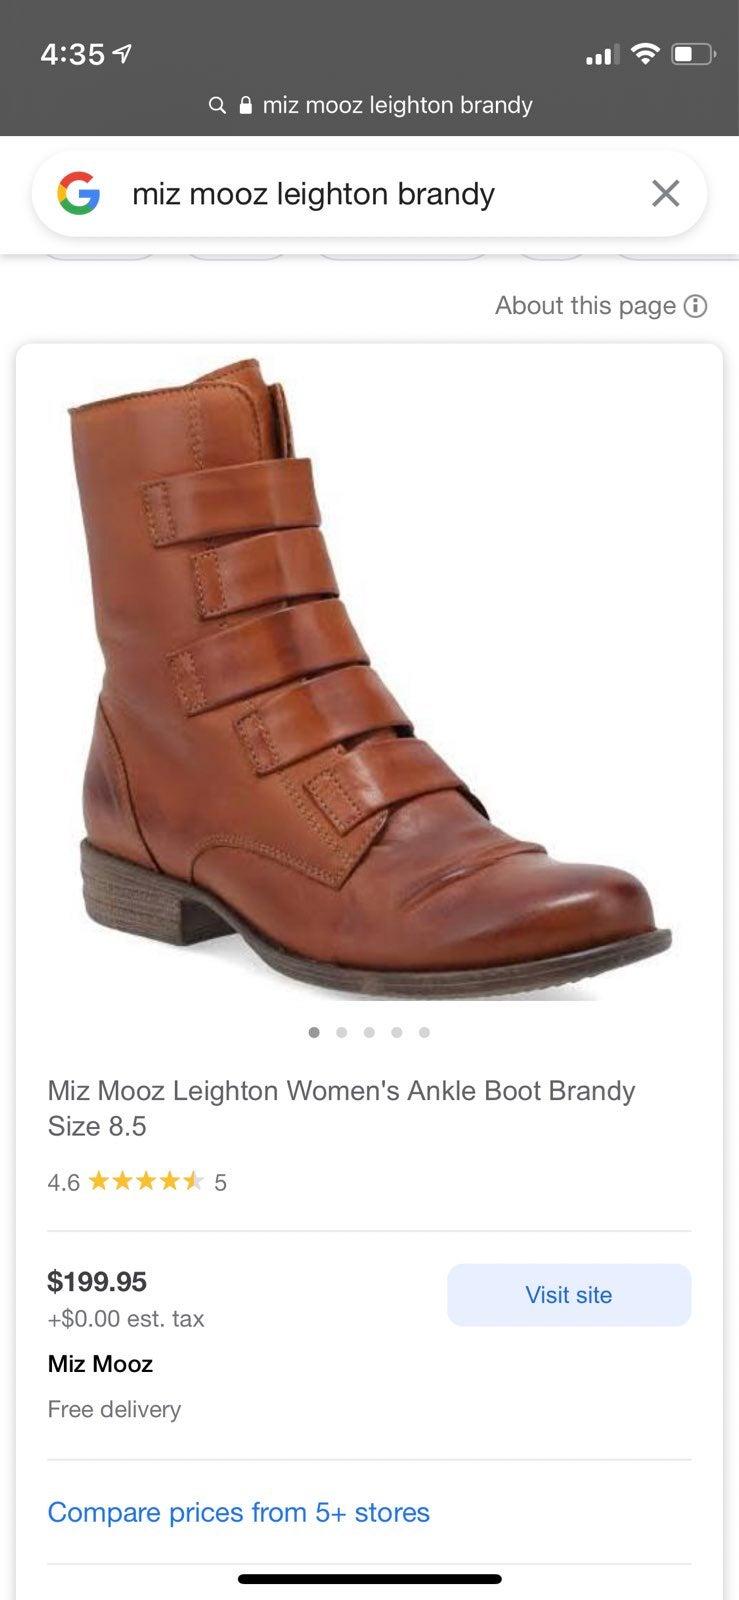 miz mooz leighton brandy boots